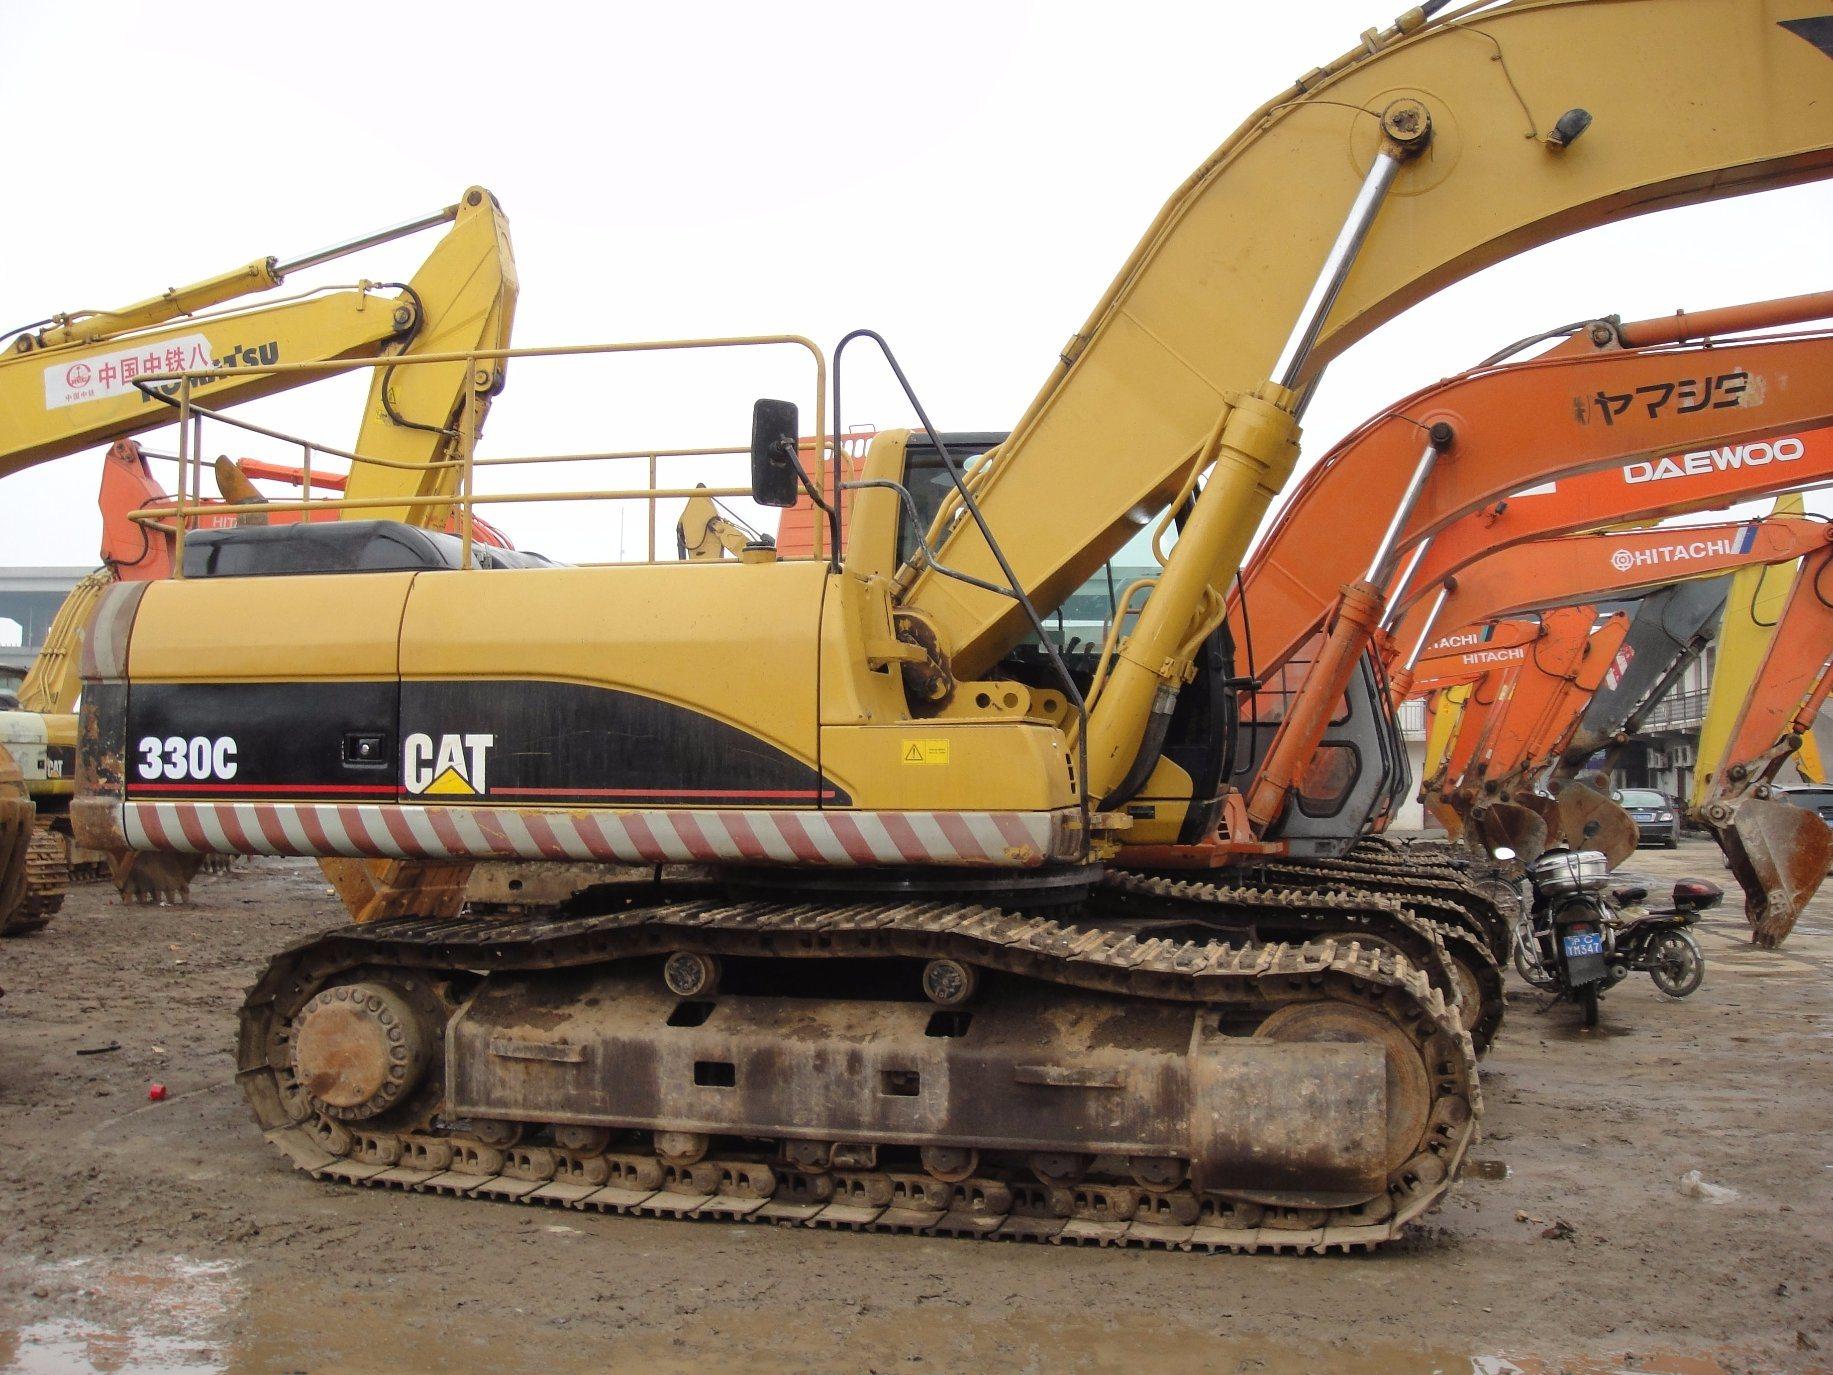 hight resolution of china used cat 330 excavator 330bl excavator caterpillar 330b excavator cat 330c cat 330d for sale china caterpillar 330 excavator